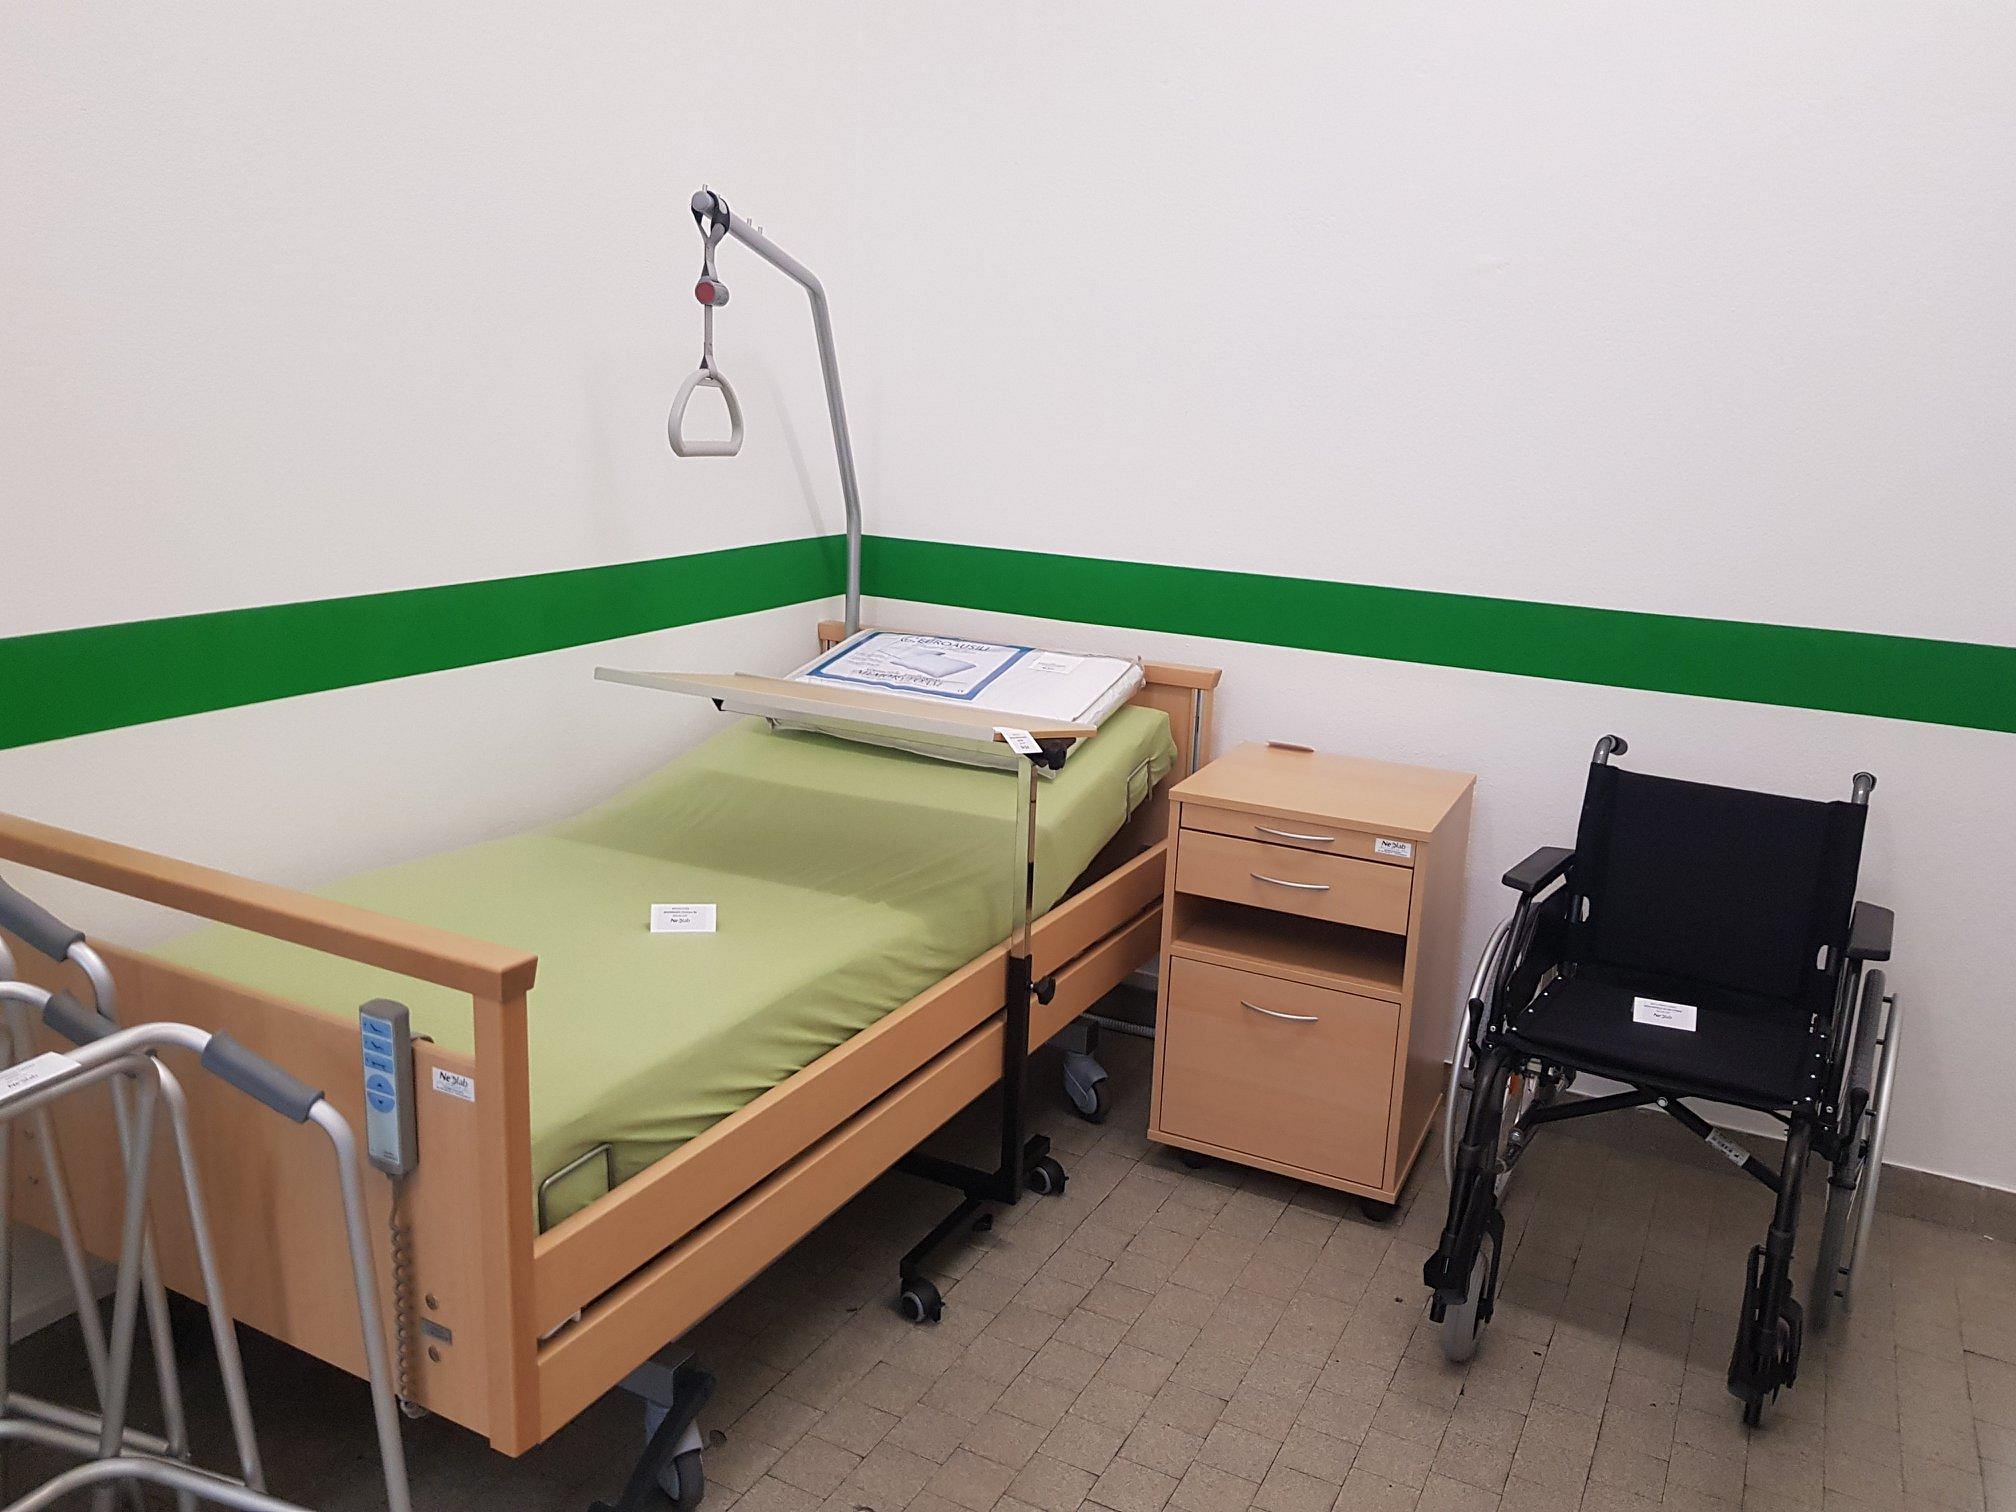 Farmacia del parco sa in lugano adresse & Öffnungszeiten auf local